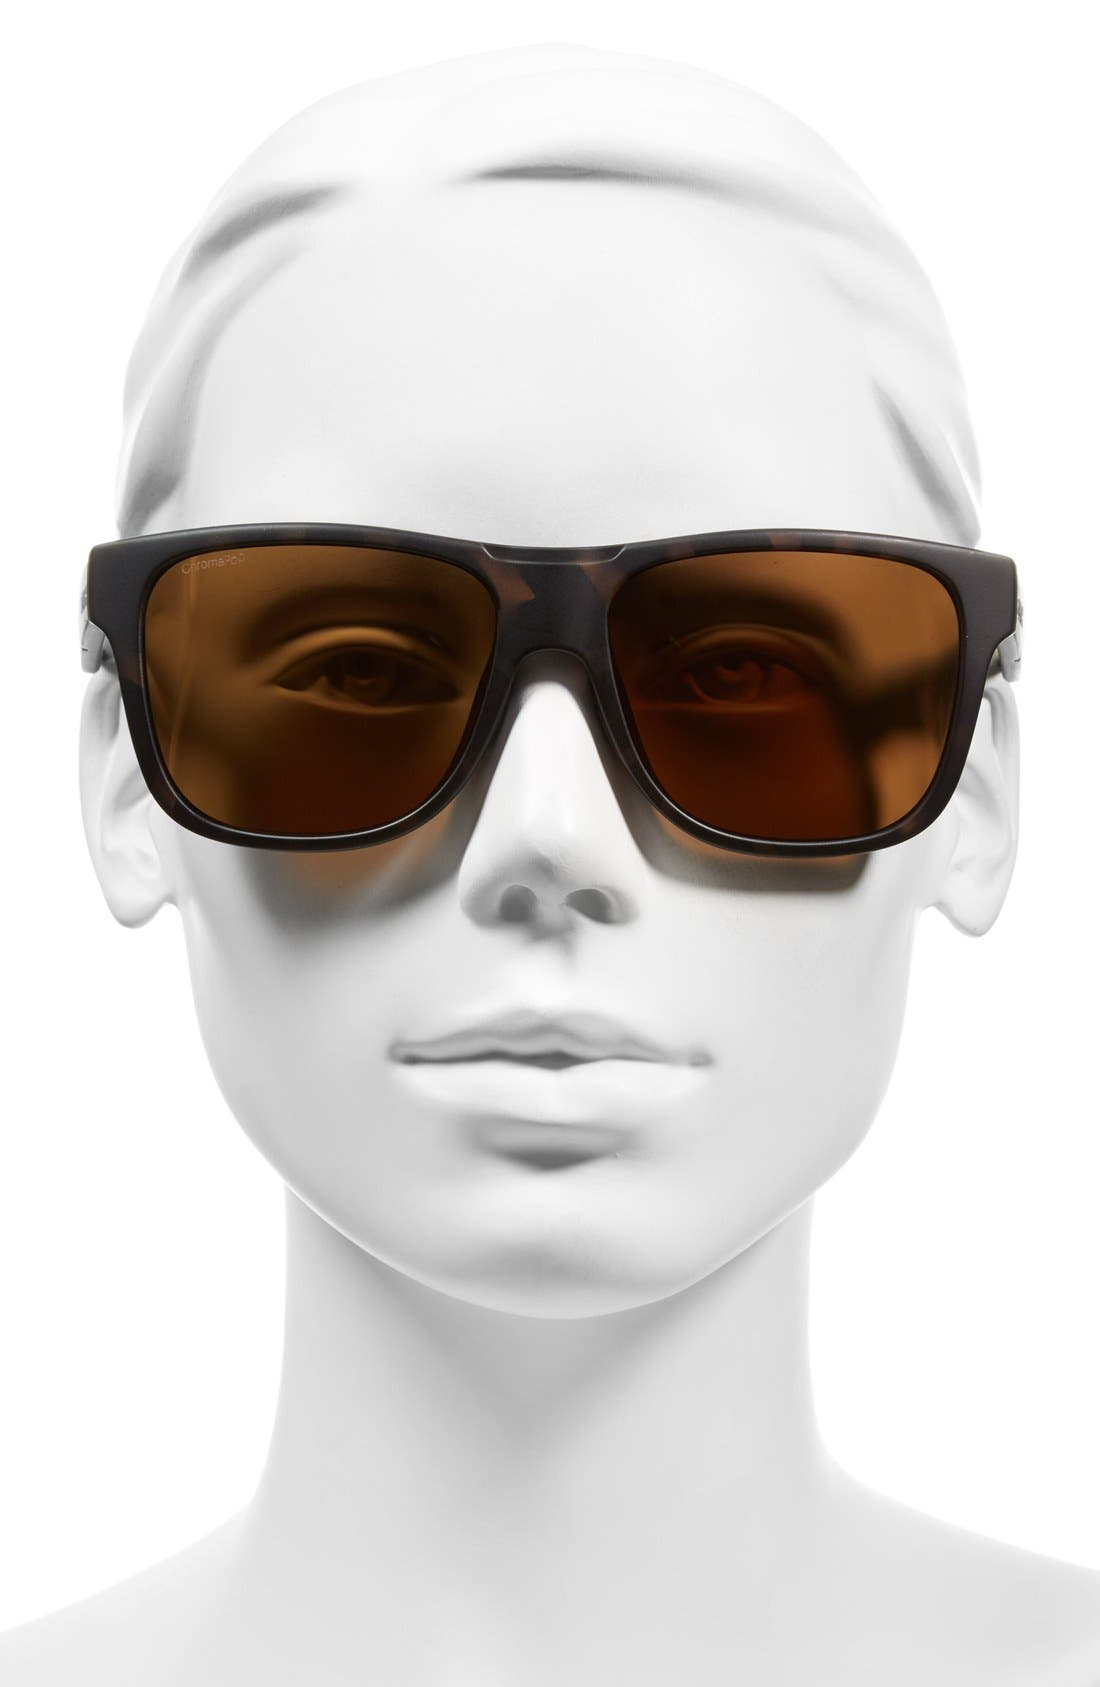 'Lowdown XL' 58mm Polarized Sunglasses,                             Alternate thumbnail 2, color,                             Matte Tortoise/ Polar Brown